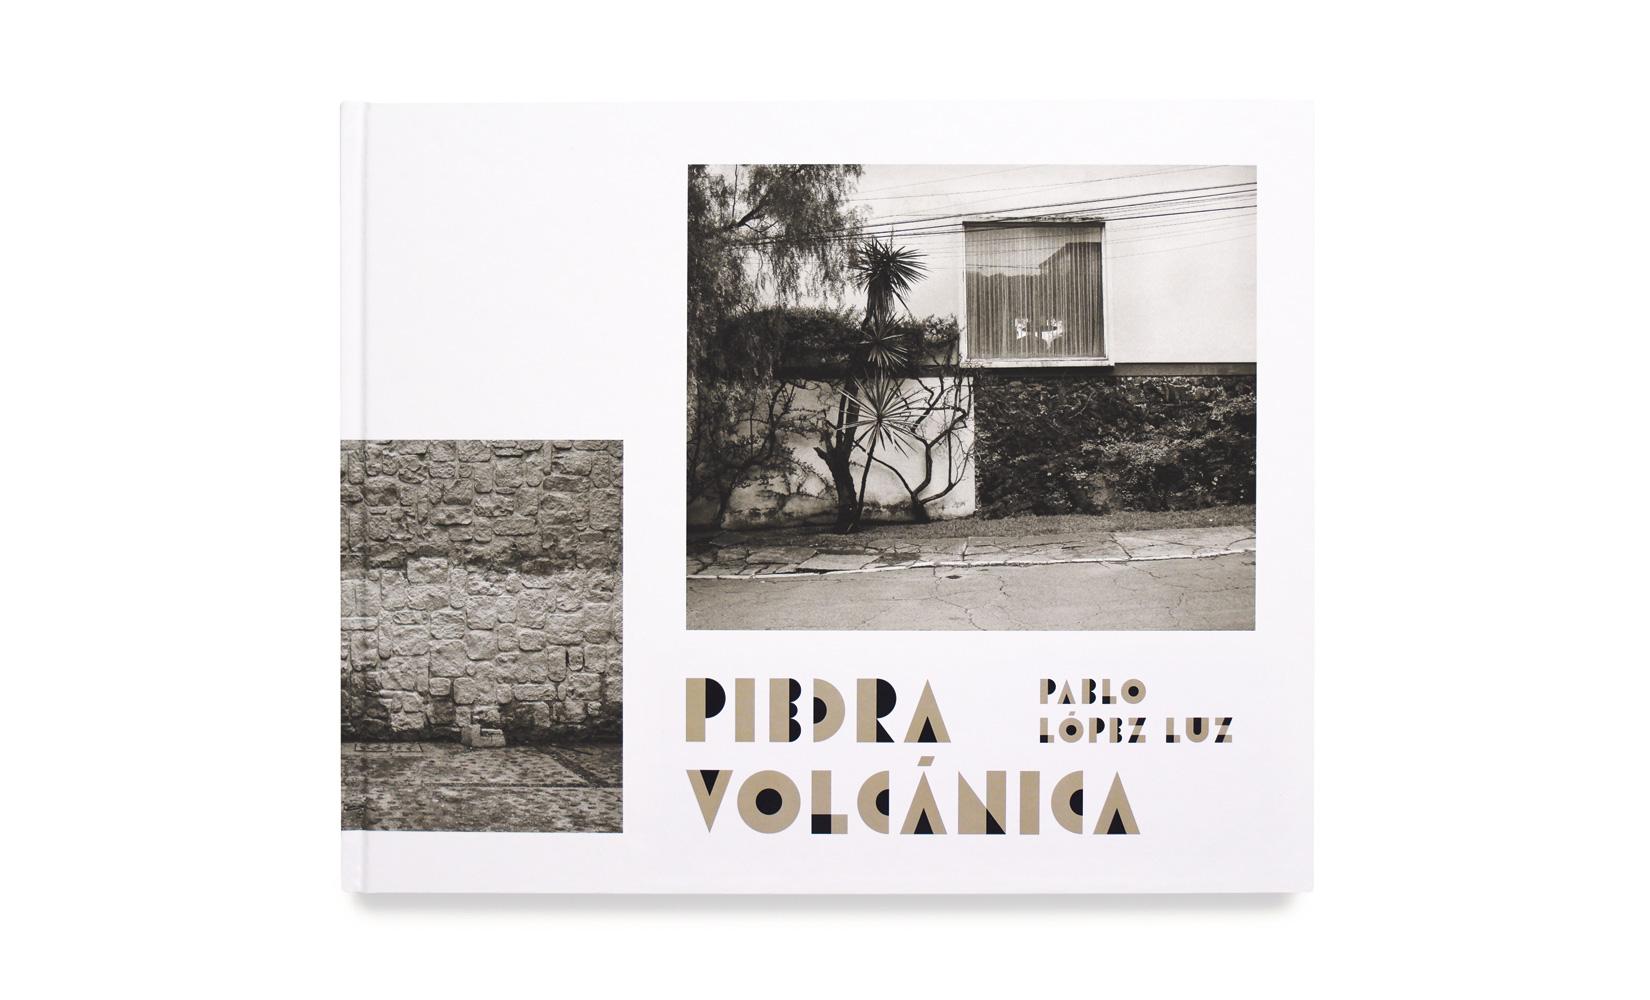 PIEDRA-VOLCANICA-PABLO-LOPEZ-LUZ-TOLUCA-STUDIO-02.jpg